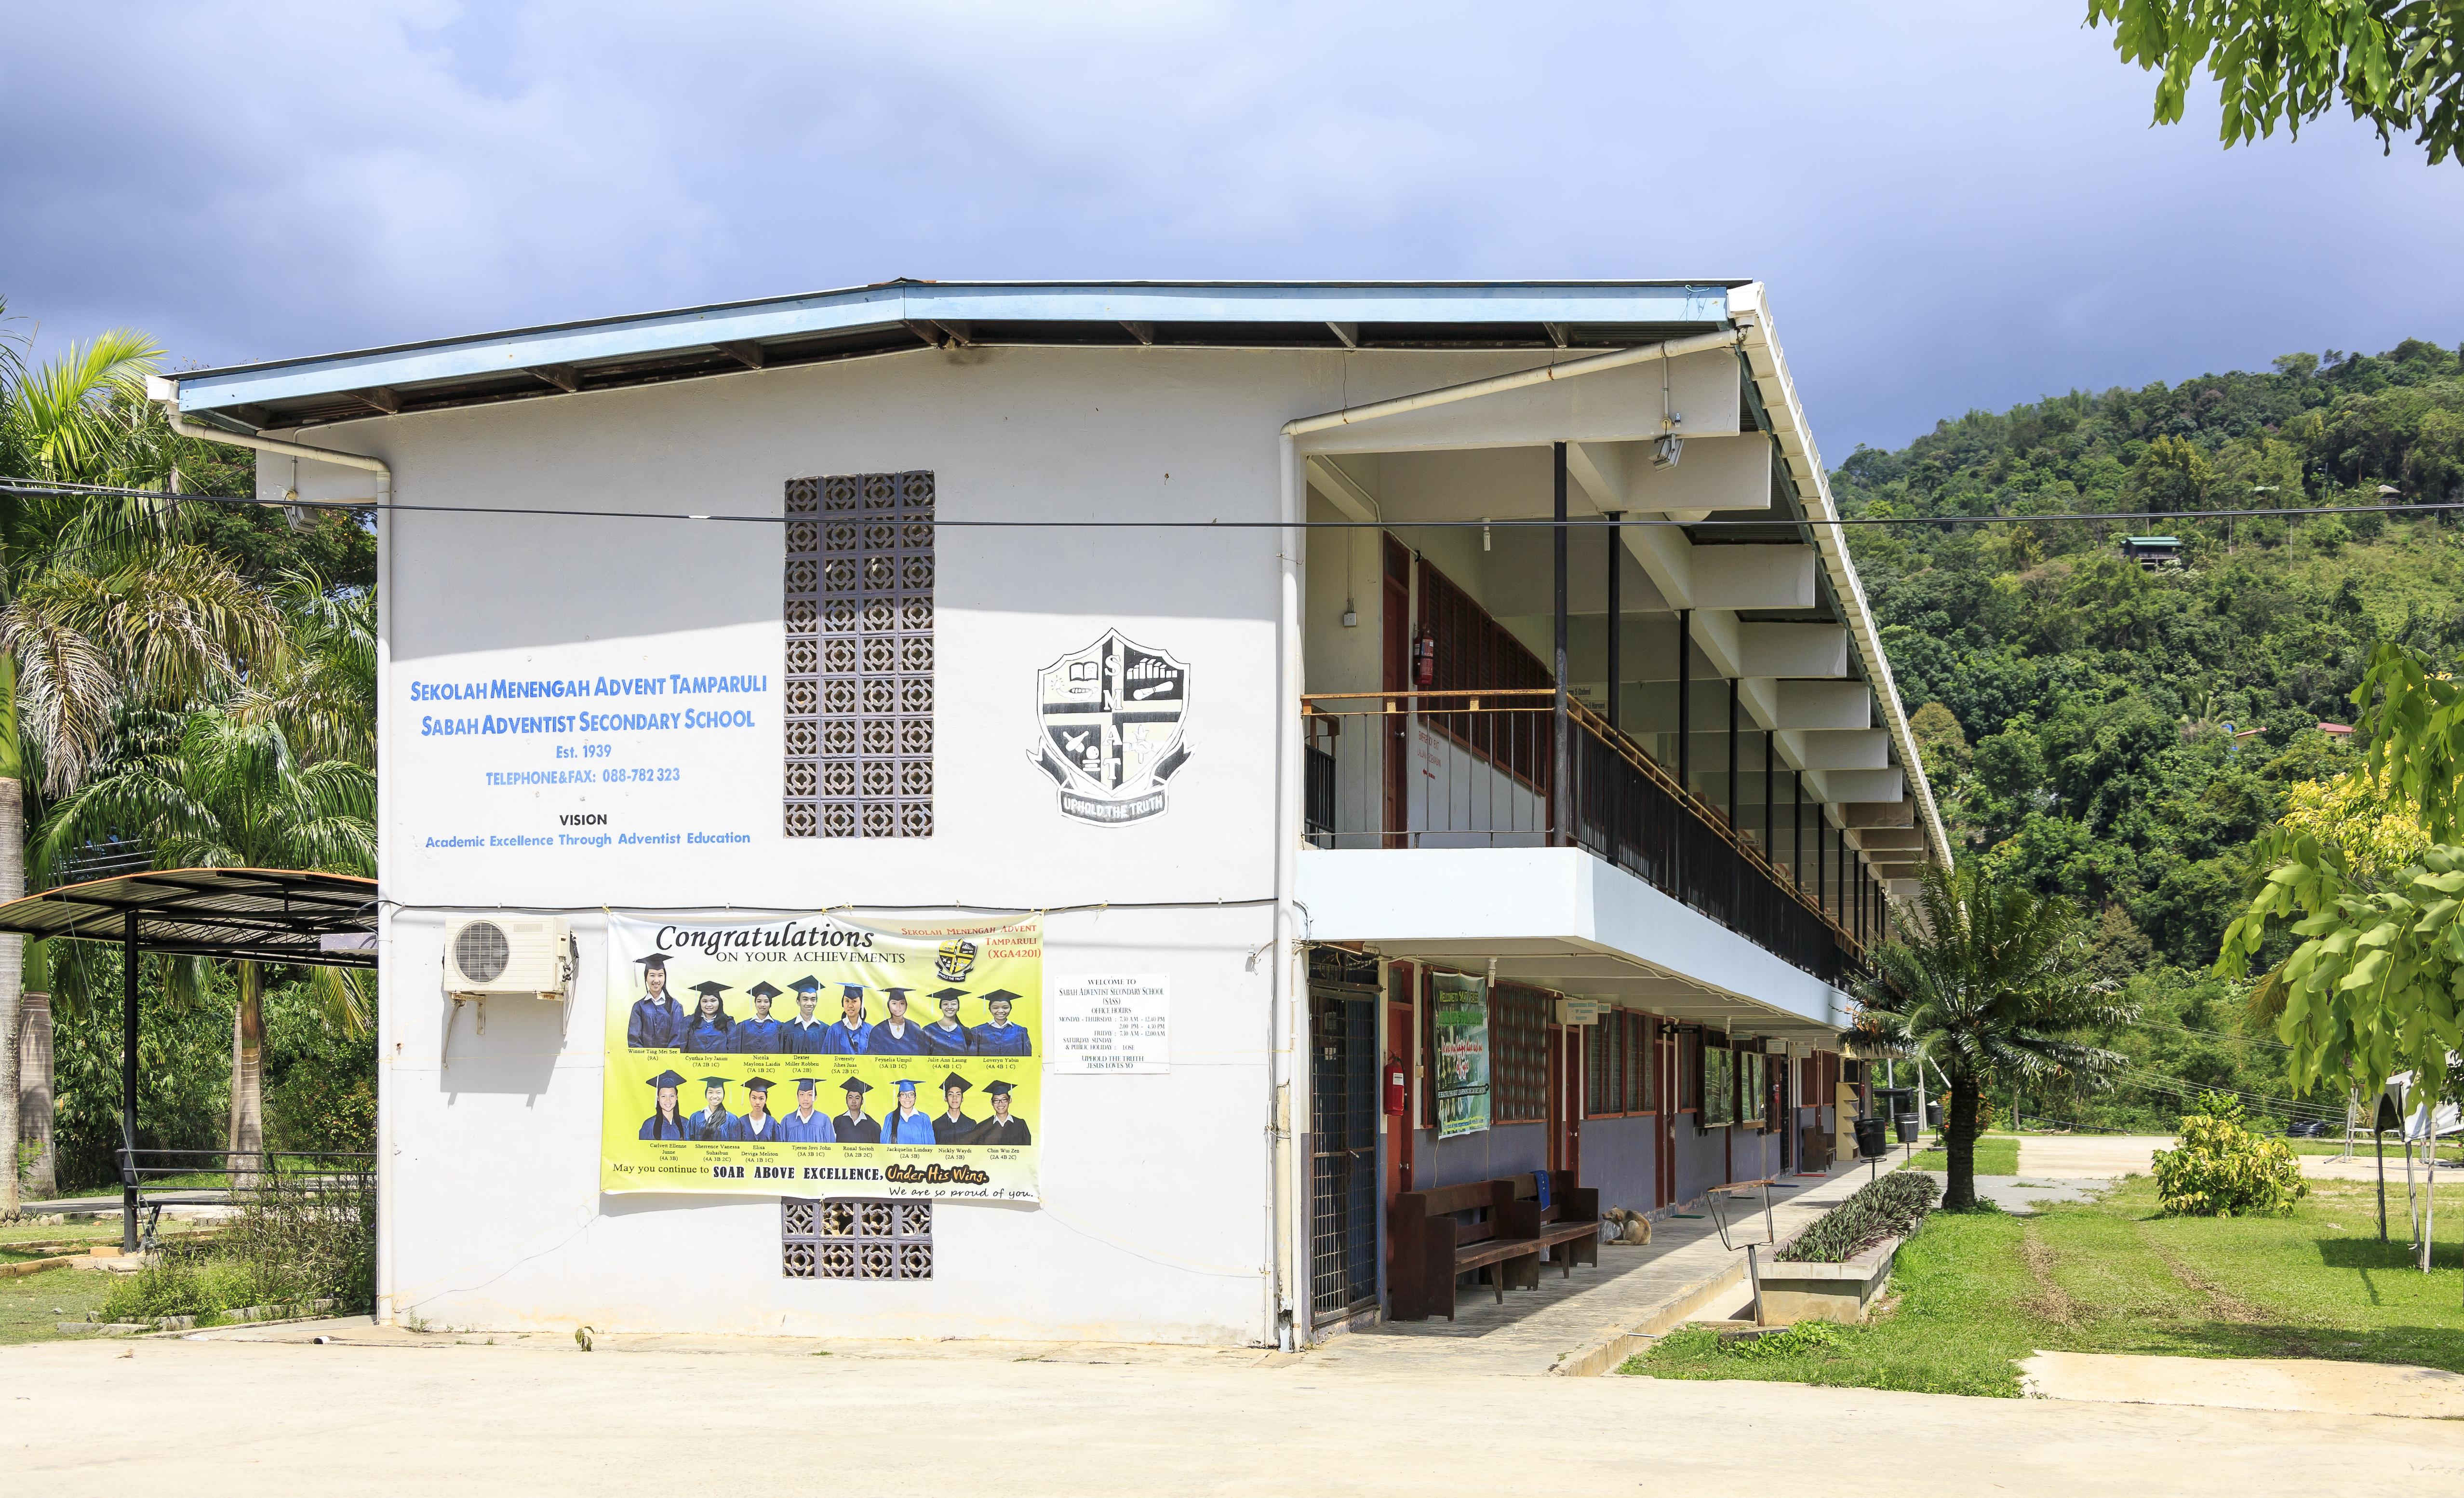 File Tamparuli Sabah SM-Advent-Tamparuli-02.jpg - Wikimedia Commons c136cb823b6d